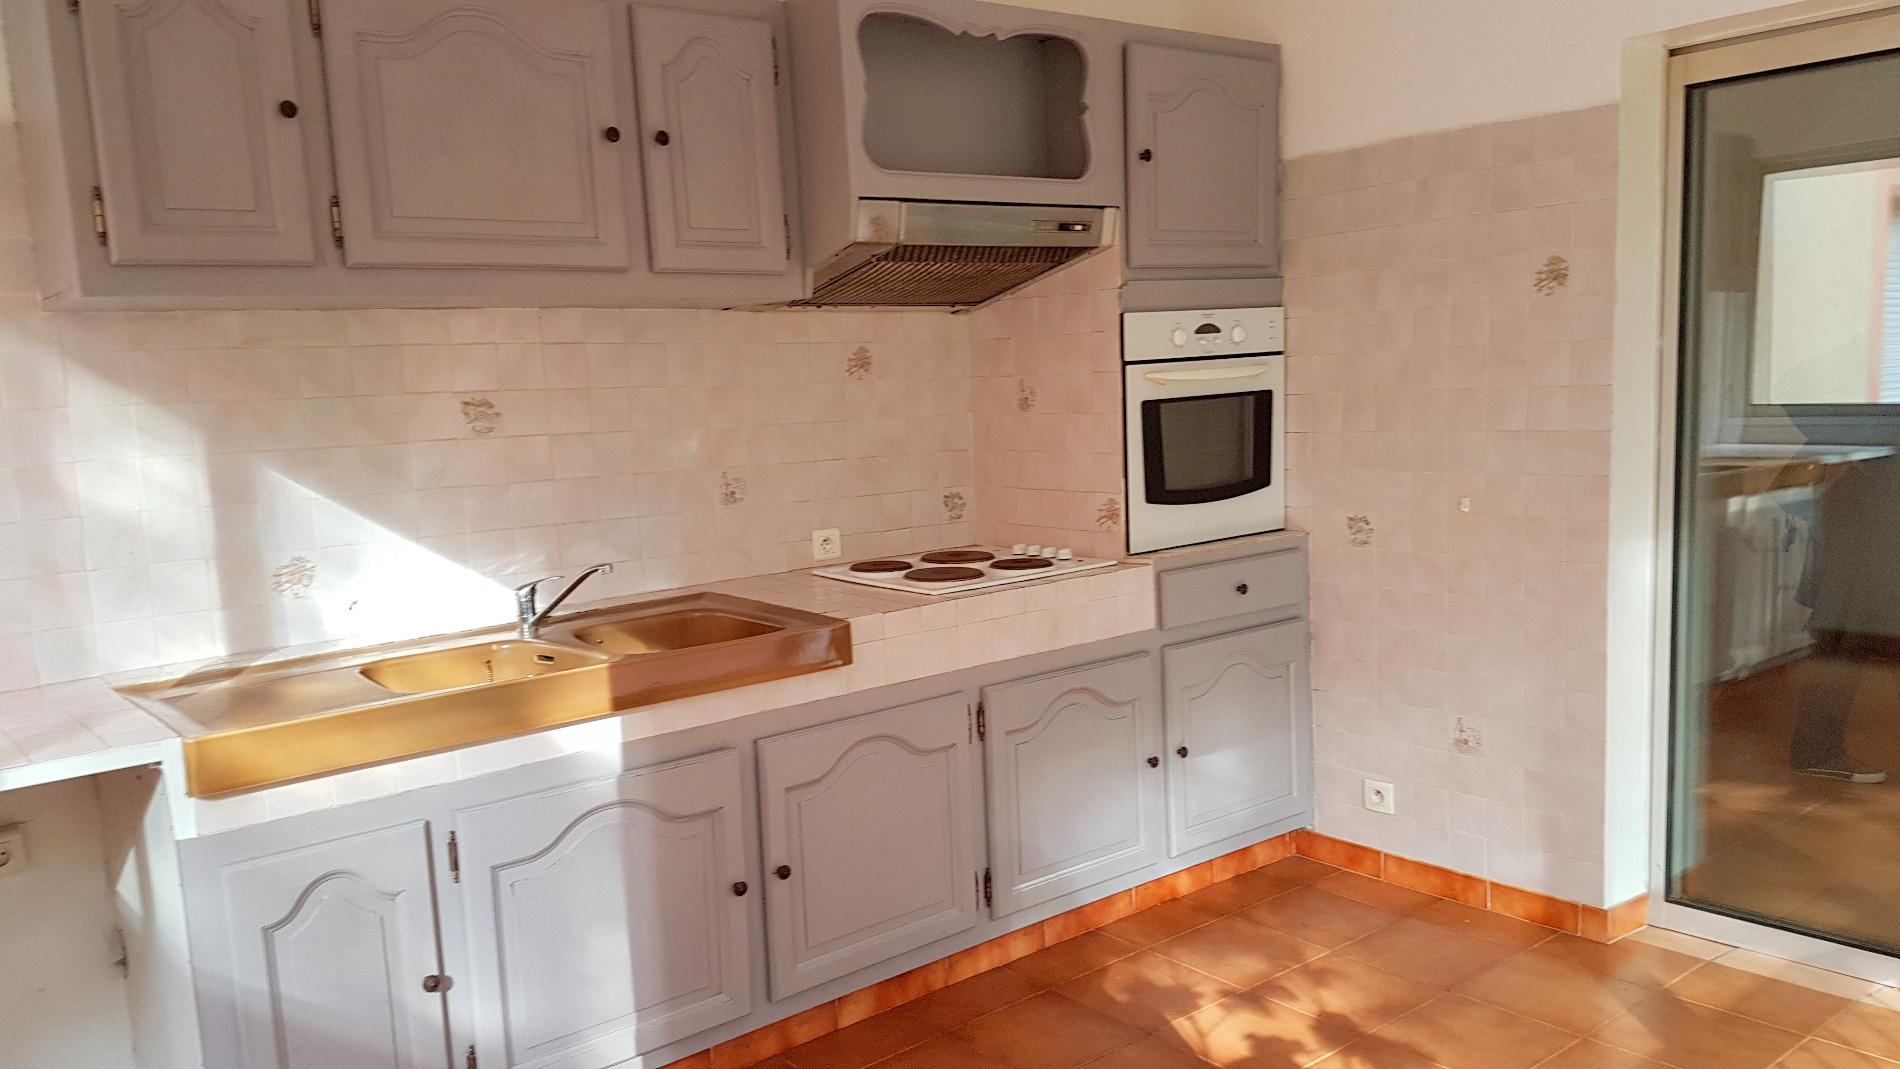 annonce vente appartement la ciotat 13600 33 m 136 500 992739621622. Black Bedroom Furniture Sets. Home Design Ideas